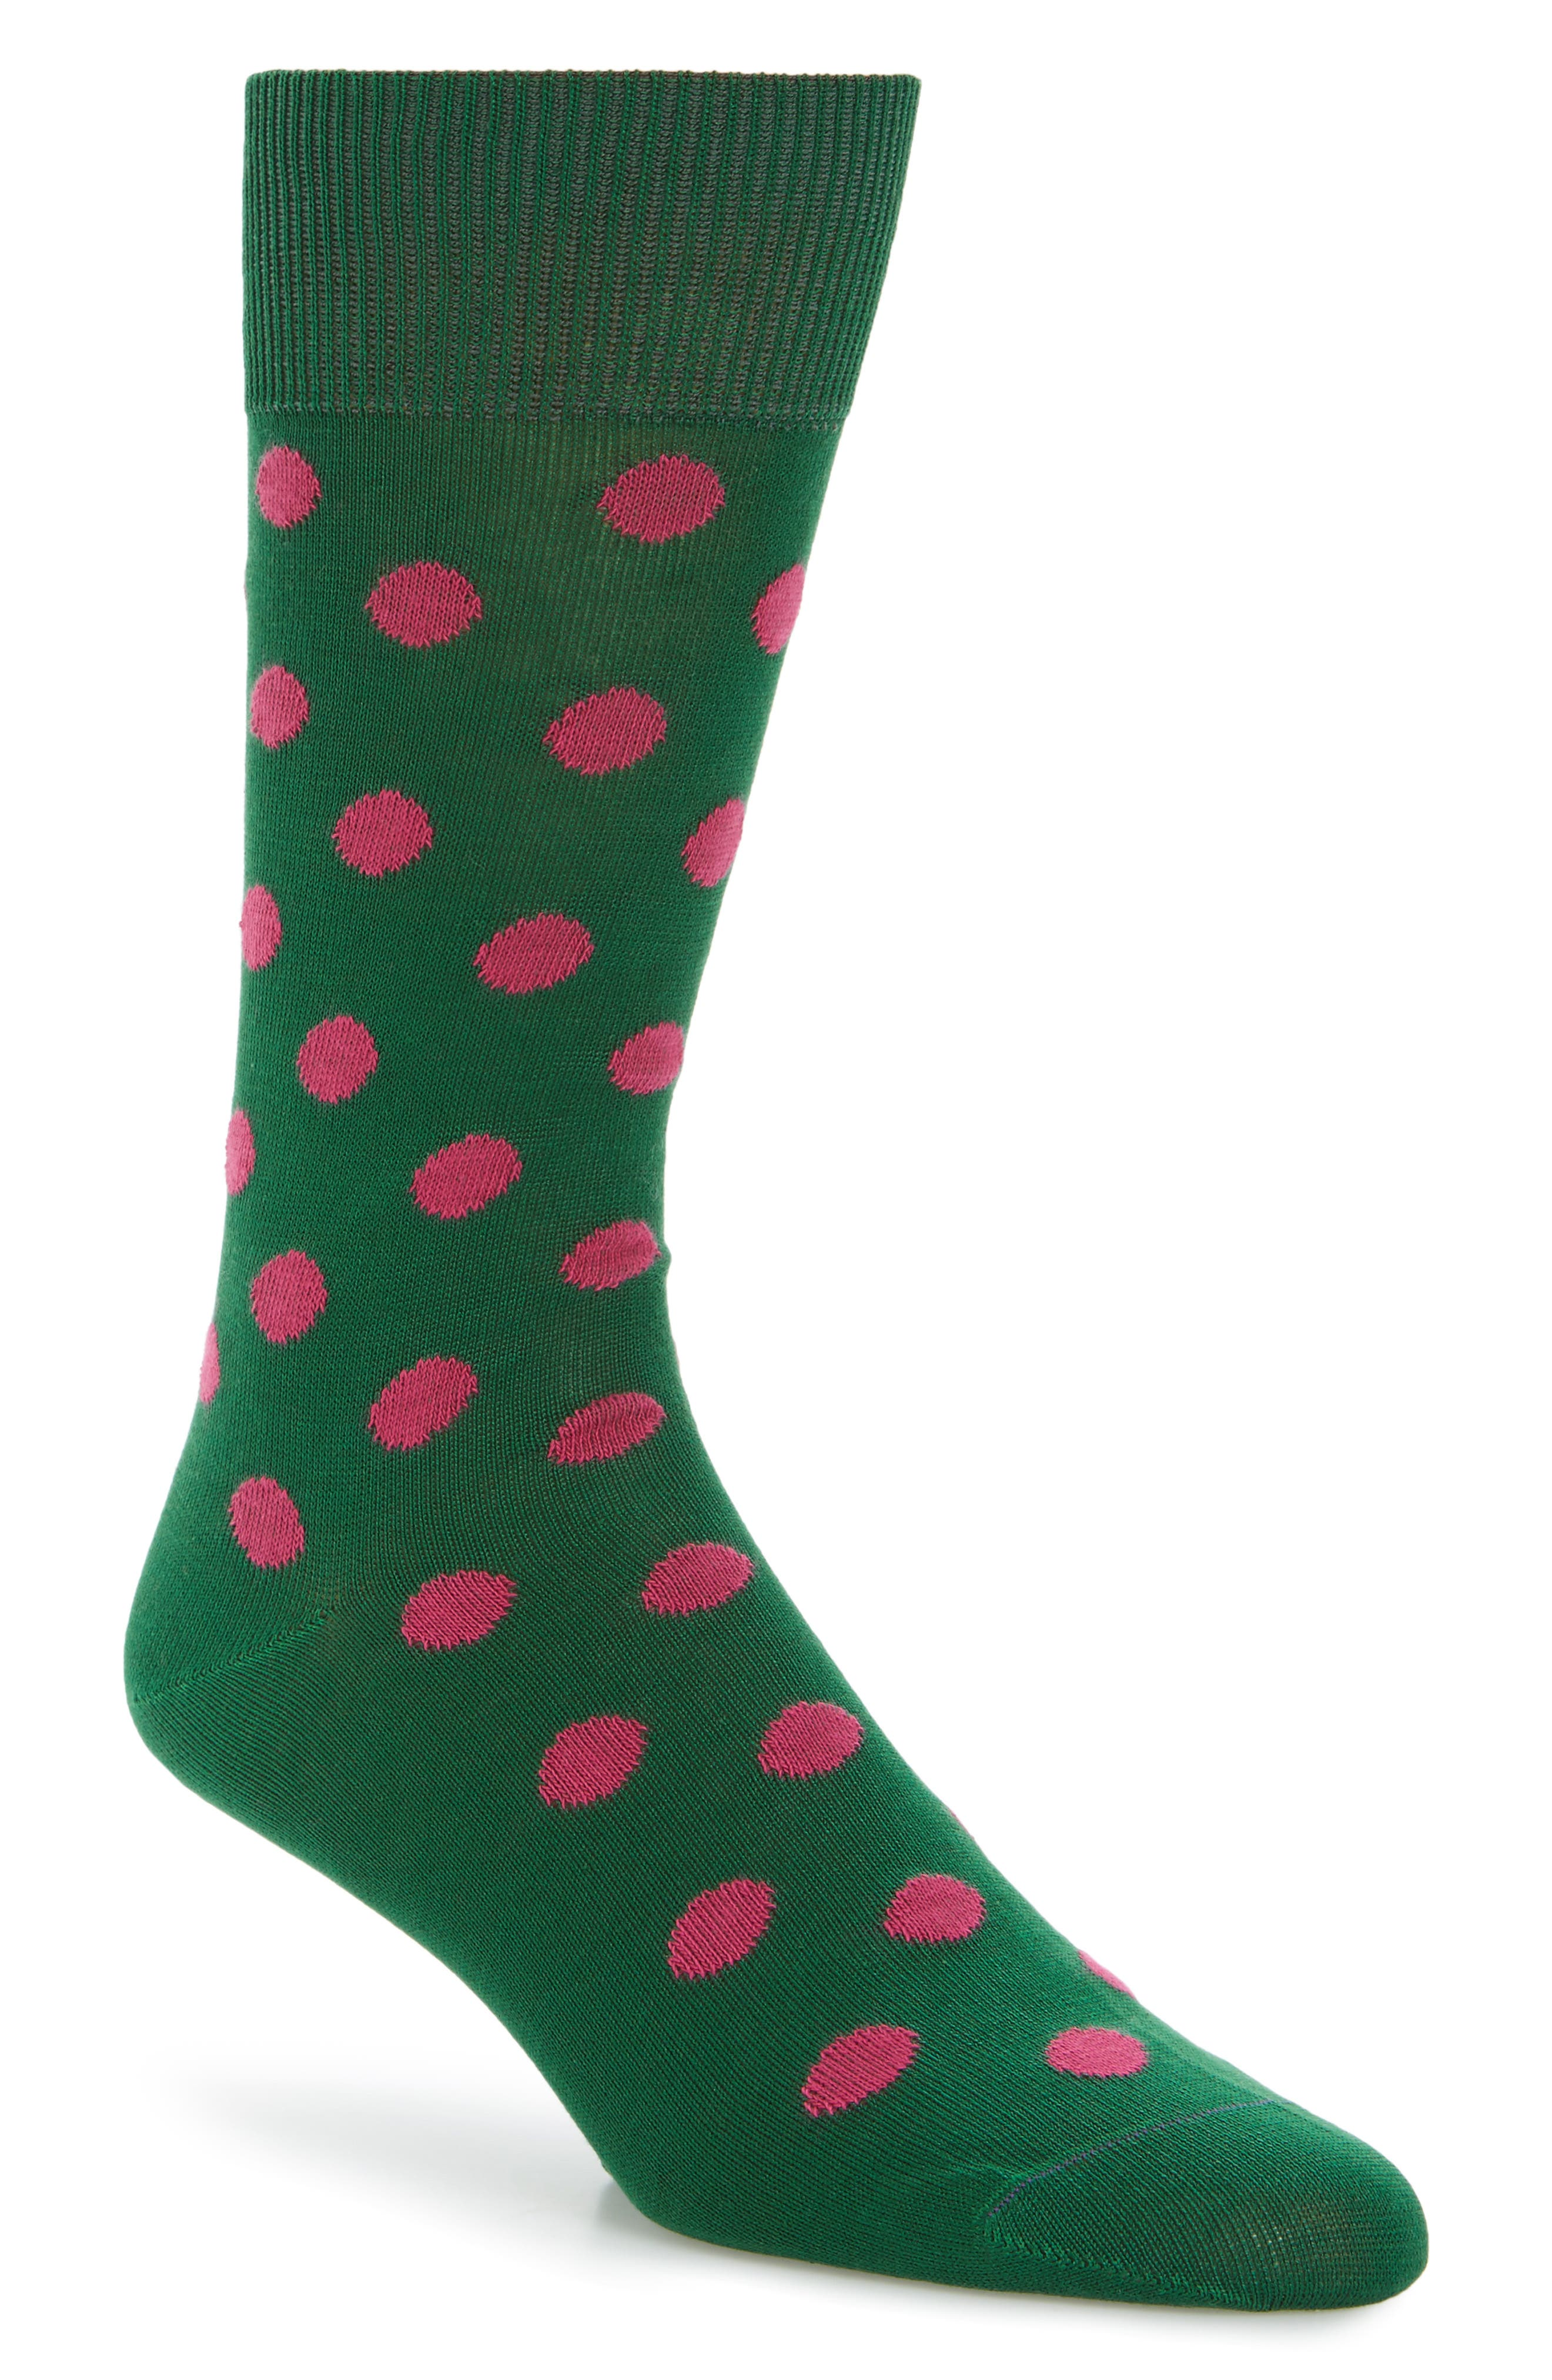 Main Image - Paul Smith Bright Polka Dot Socks